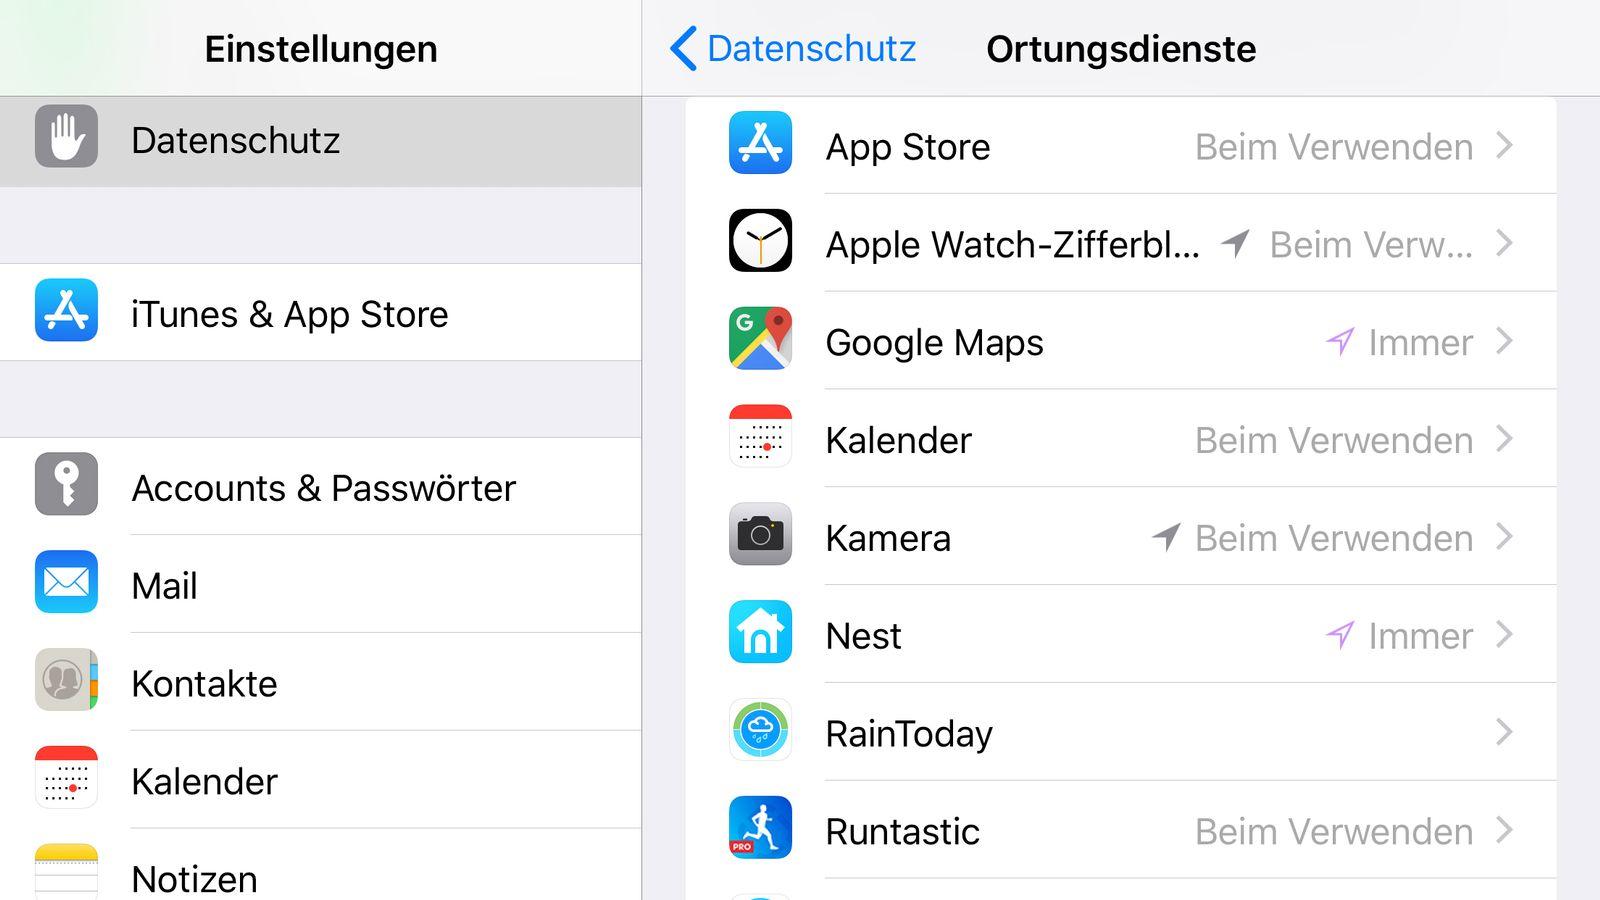 NUR ALS ZITAT Screenshot IOS 11 Datenschutz